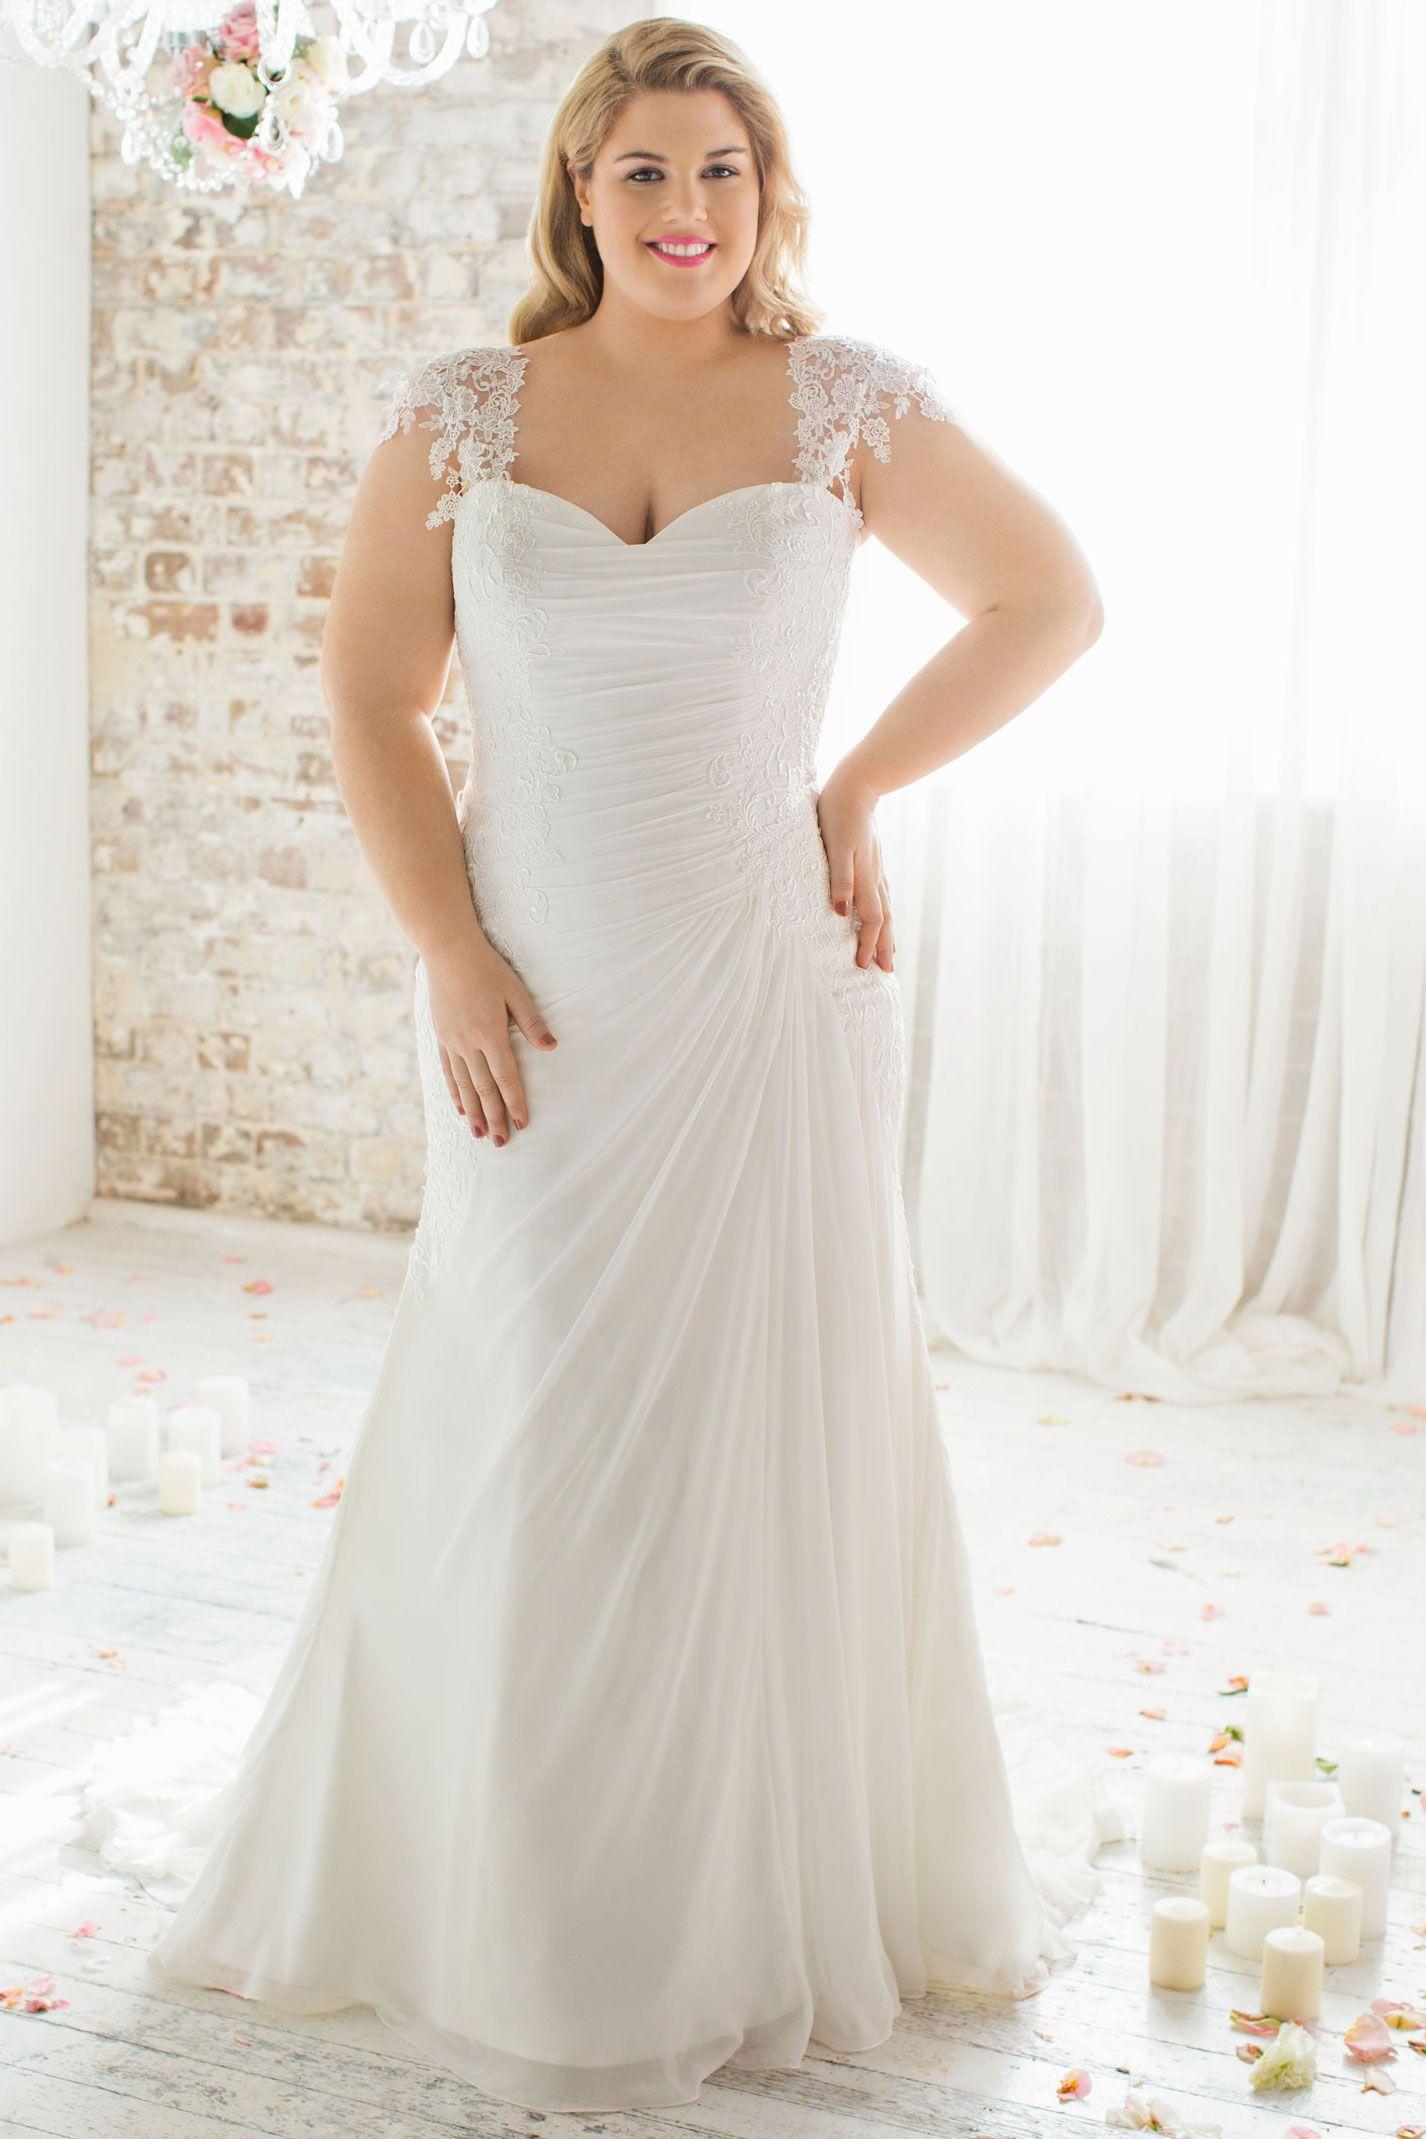 pretty pretty princess image by Tarah King Best wedding